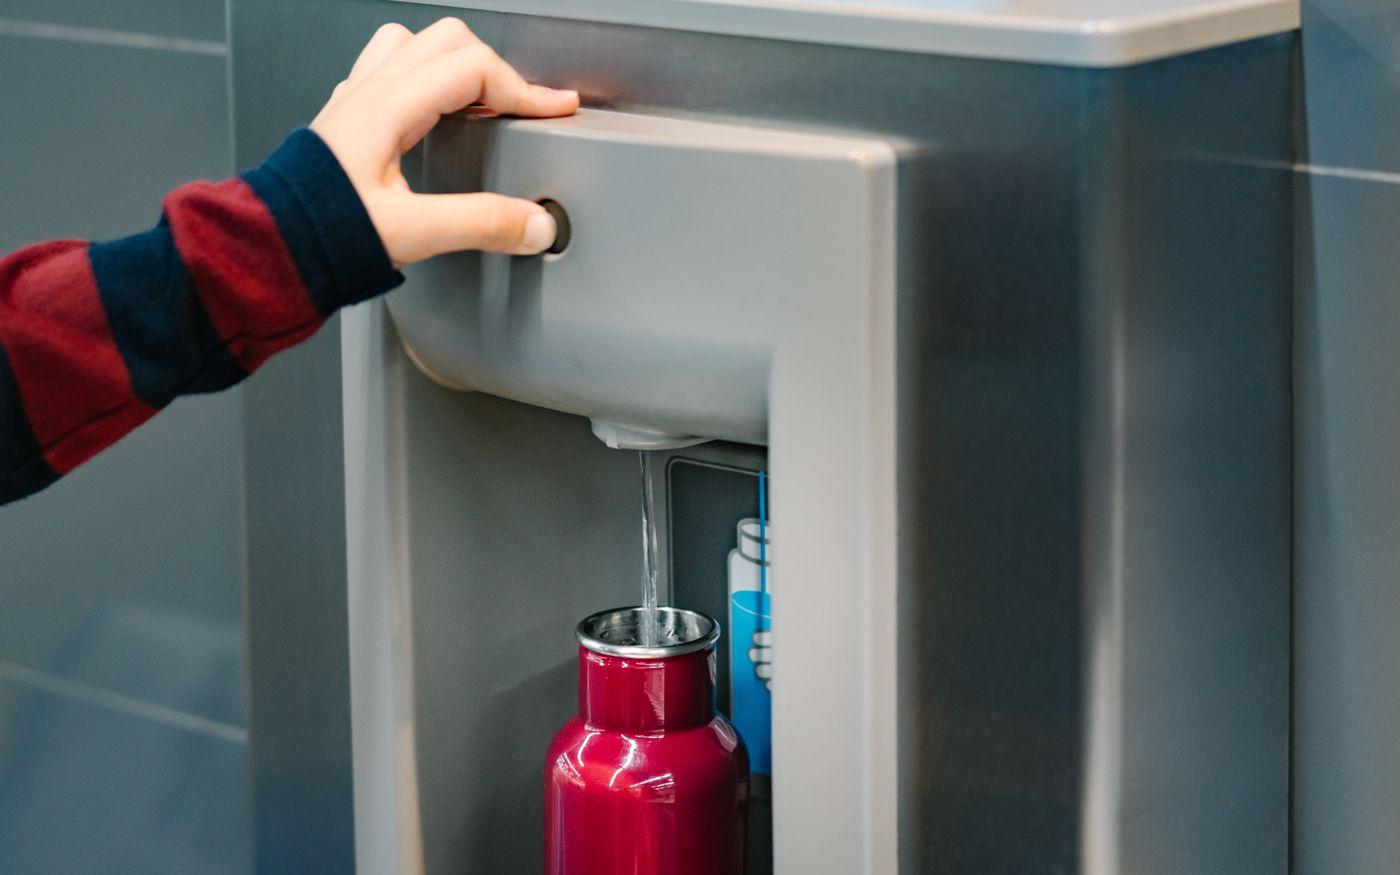 Promoting healthy beverage consumption habits among elementary school children